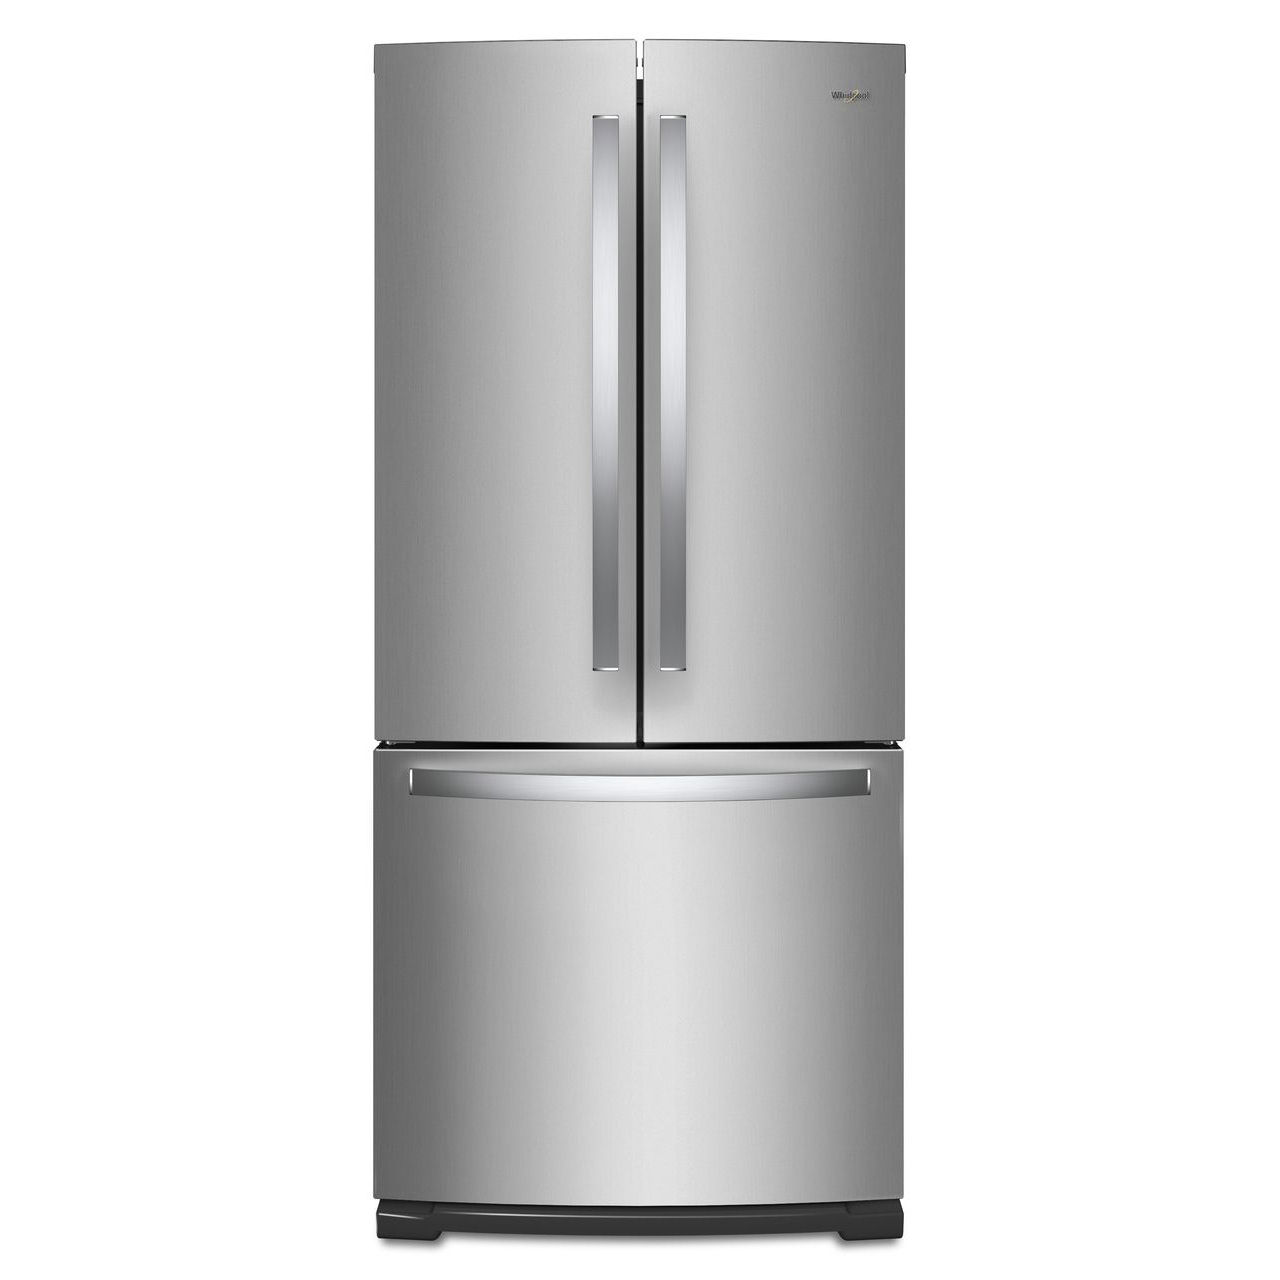 Whirlpool 20 Cu. Ft. French Door Bottom Mount Refrigerator